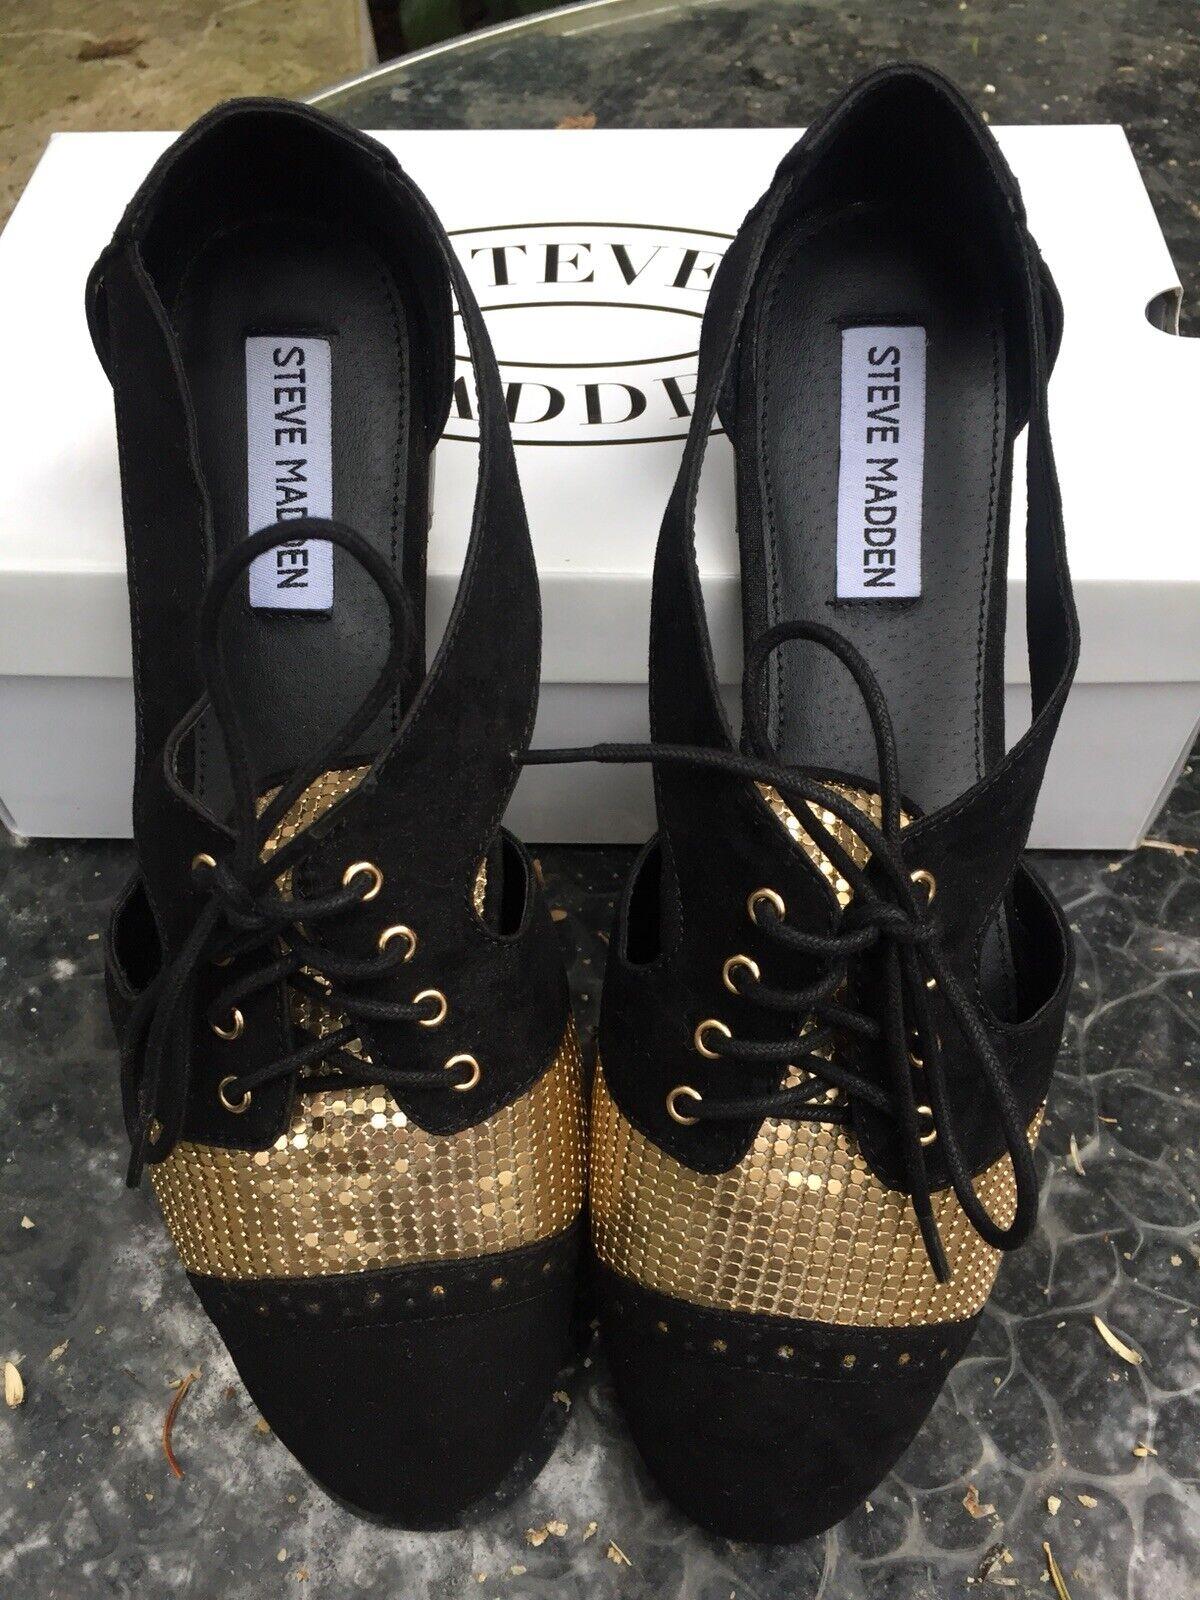 STEVE MADDEN Cori Oxford Loafers 39 Gold Pailetten Wildleder Miu Blogger Turnschuhe